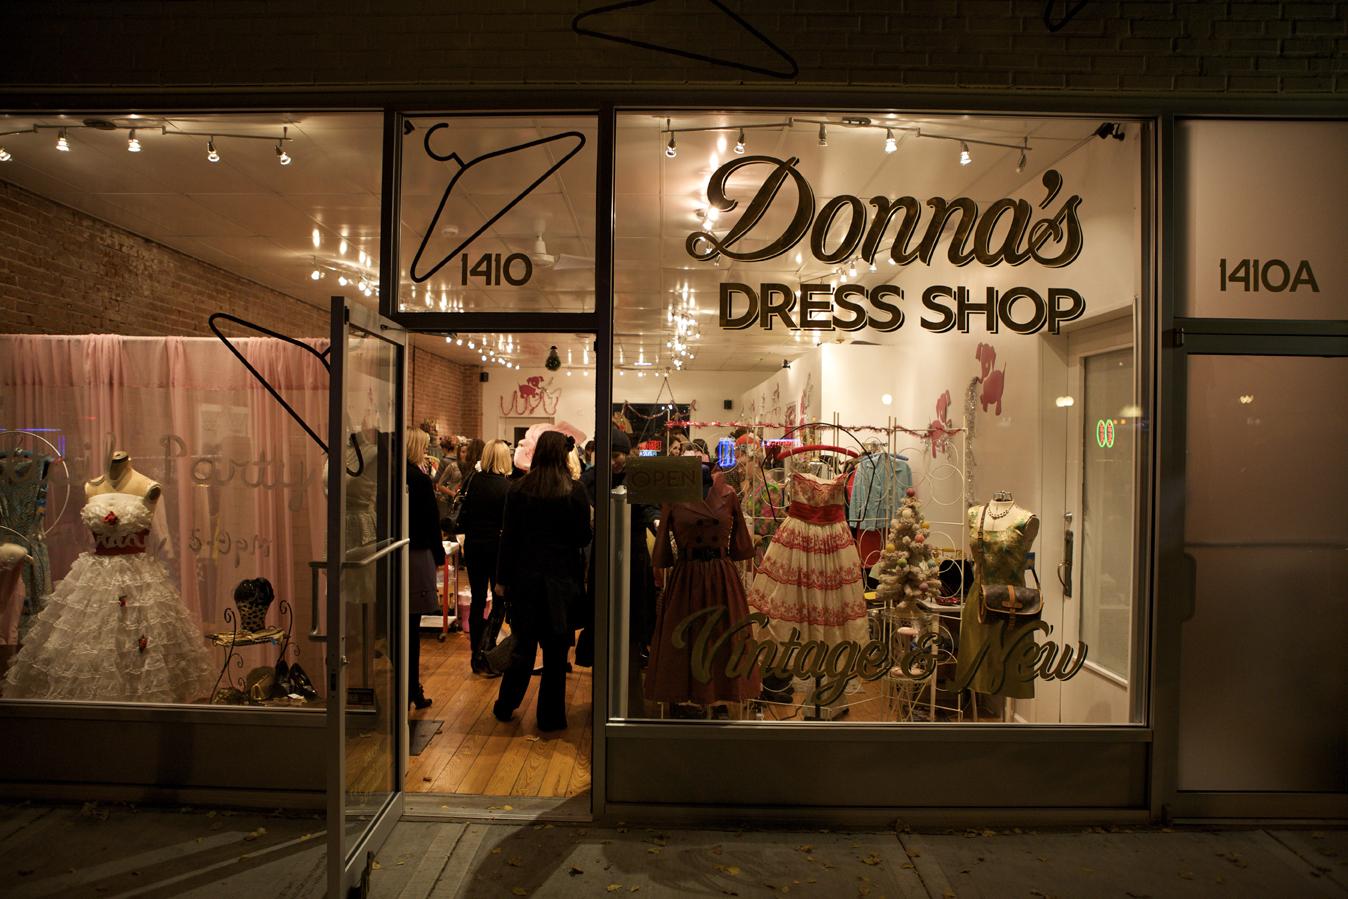 cd057f4f2cd JADATO  Donna s Dress Shop